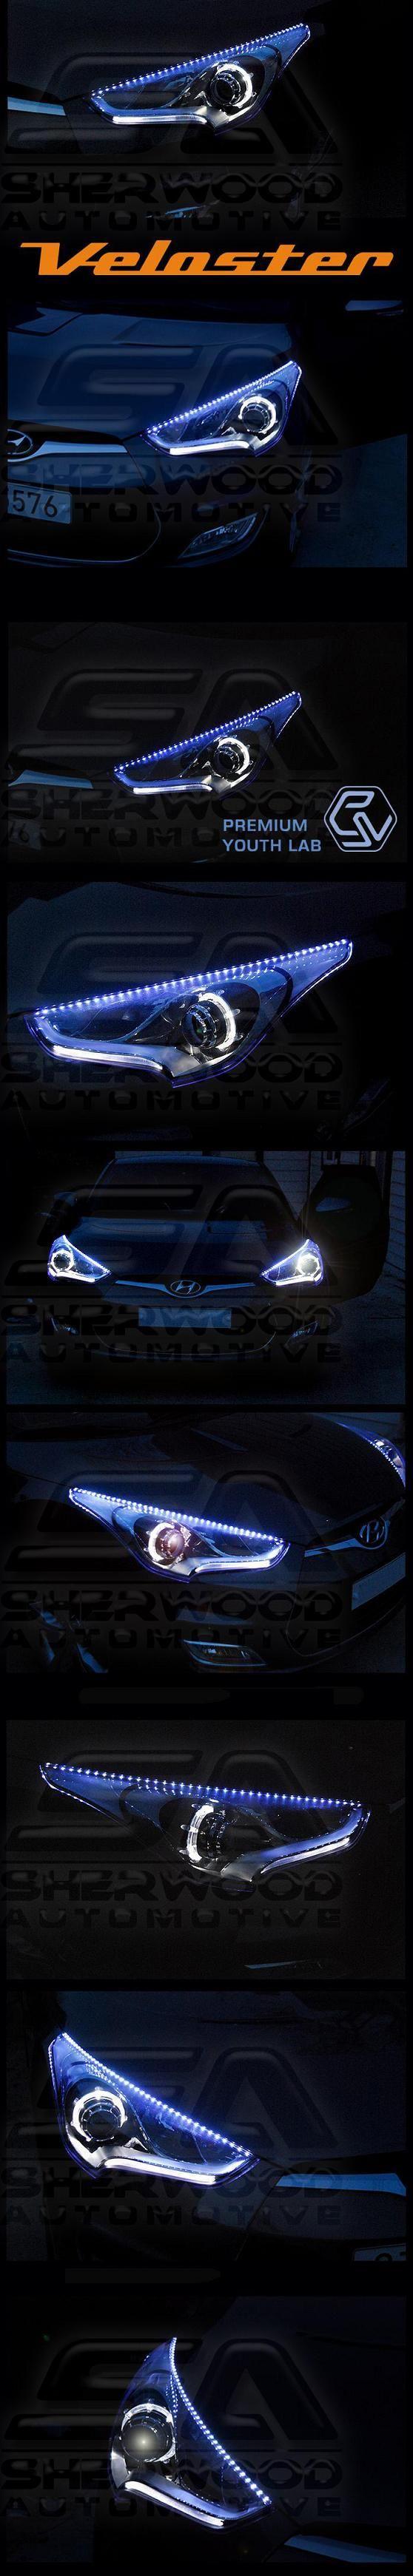 Veloster LED Headlight Eyeline Kit - Korean Auto Imports